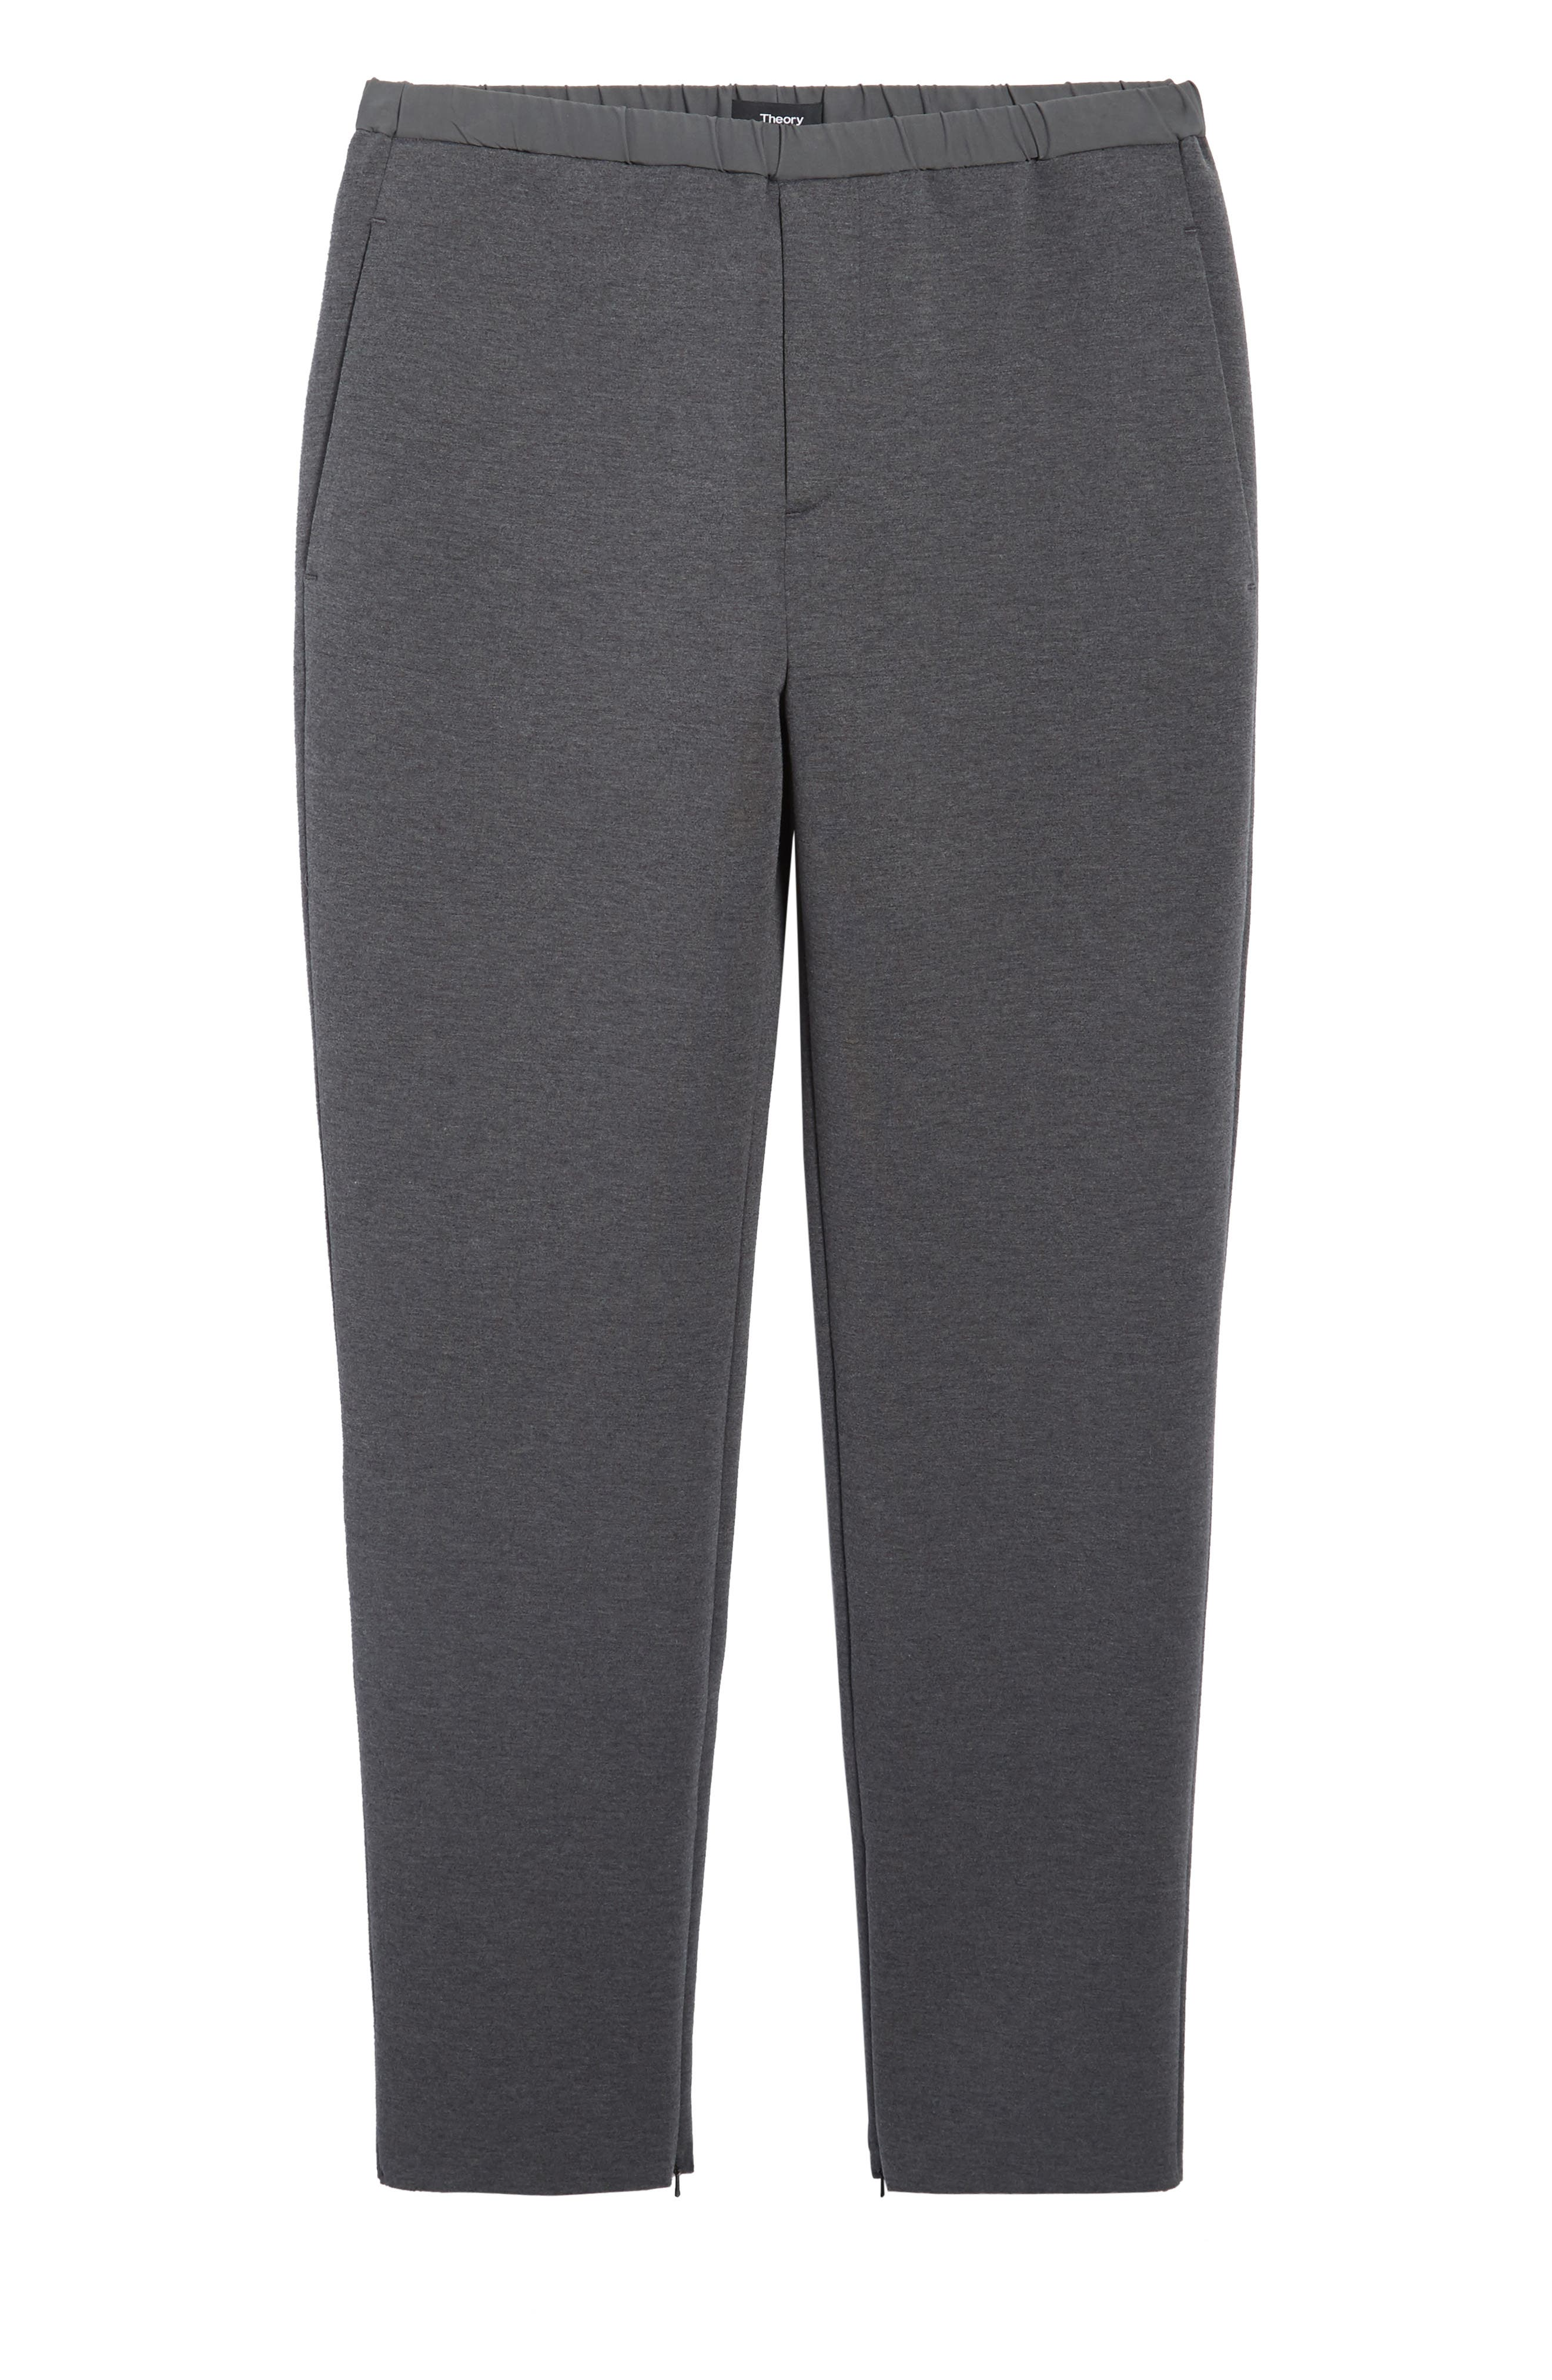 Knit Lounge Pants,                             Alternate thumbnail 6, color,                             Charcoal Heather